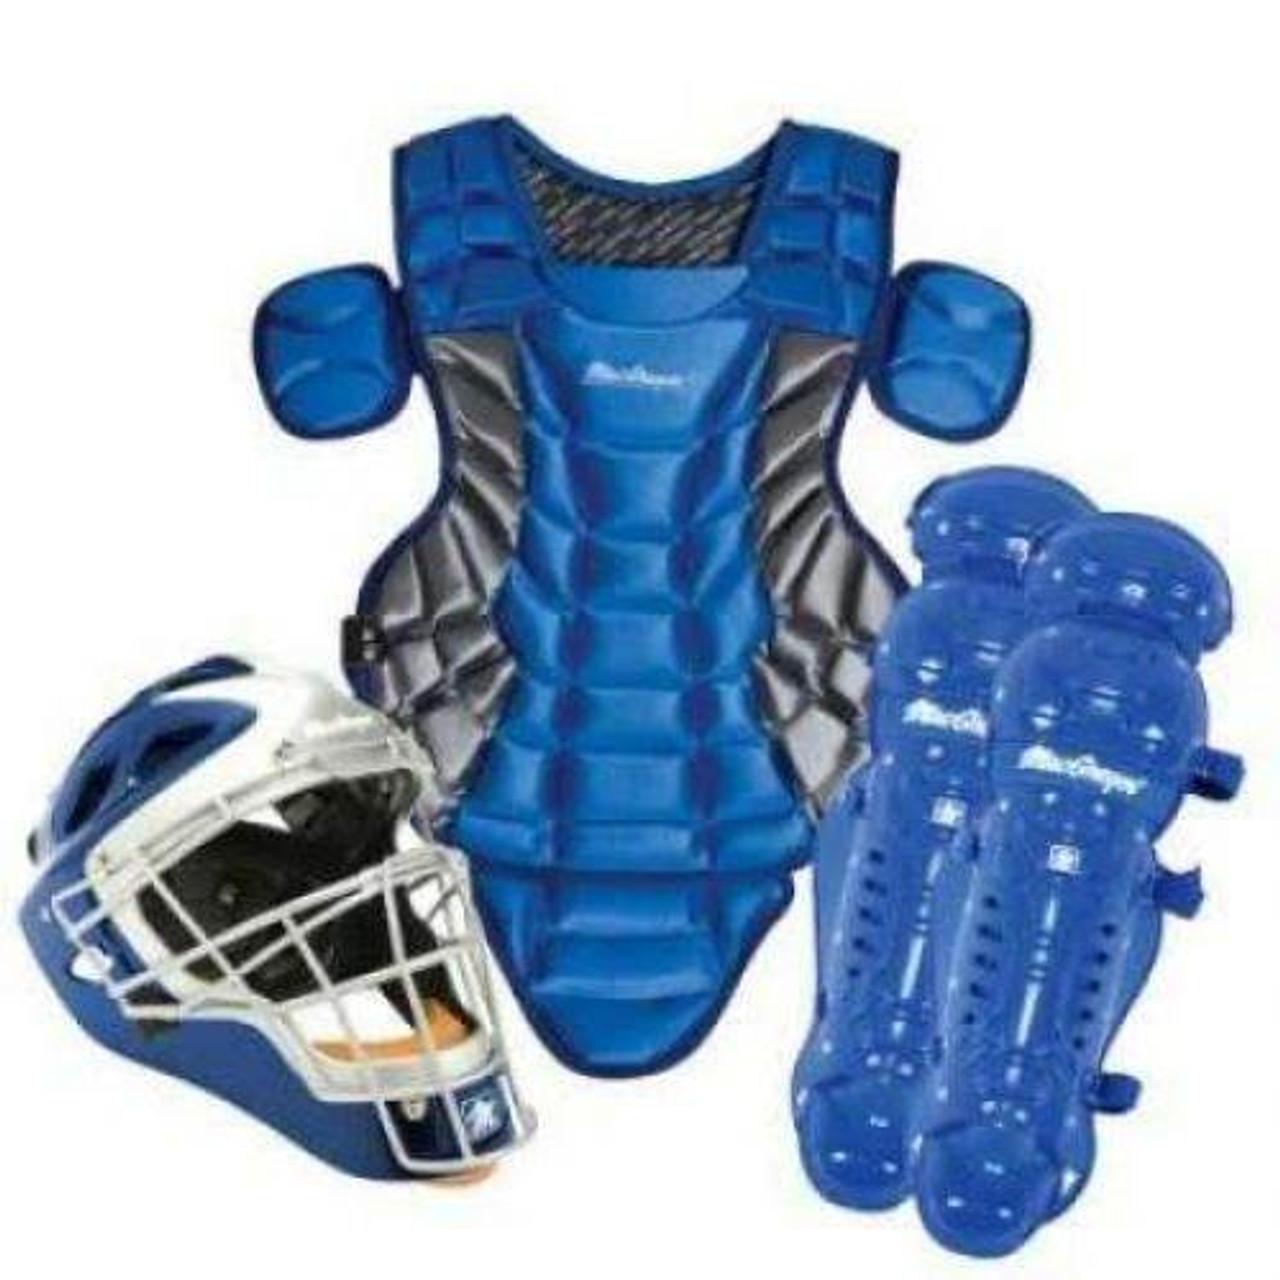 MacGregor baseball Prep Catcher's Gear Pack